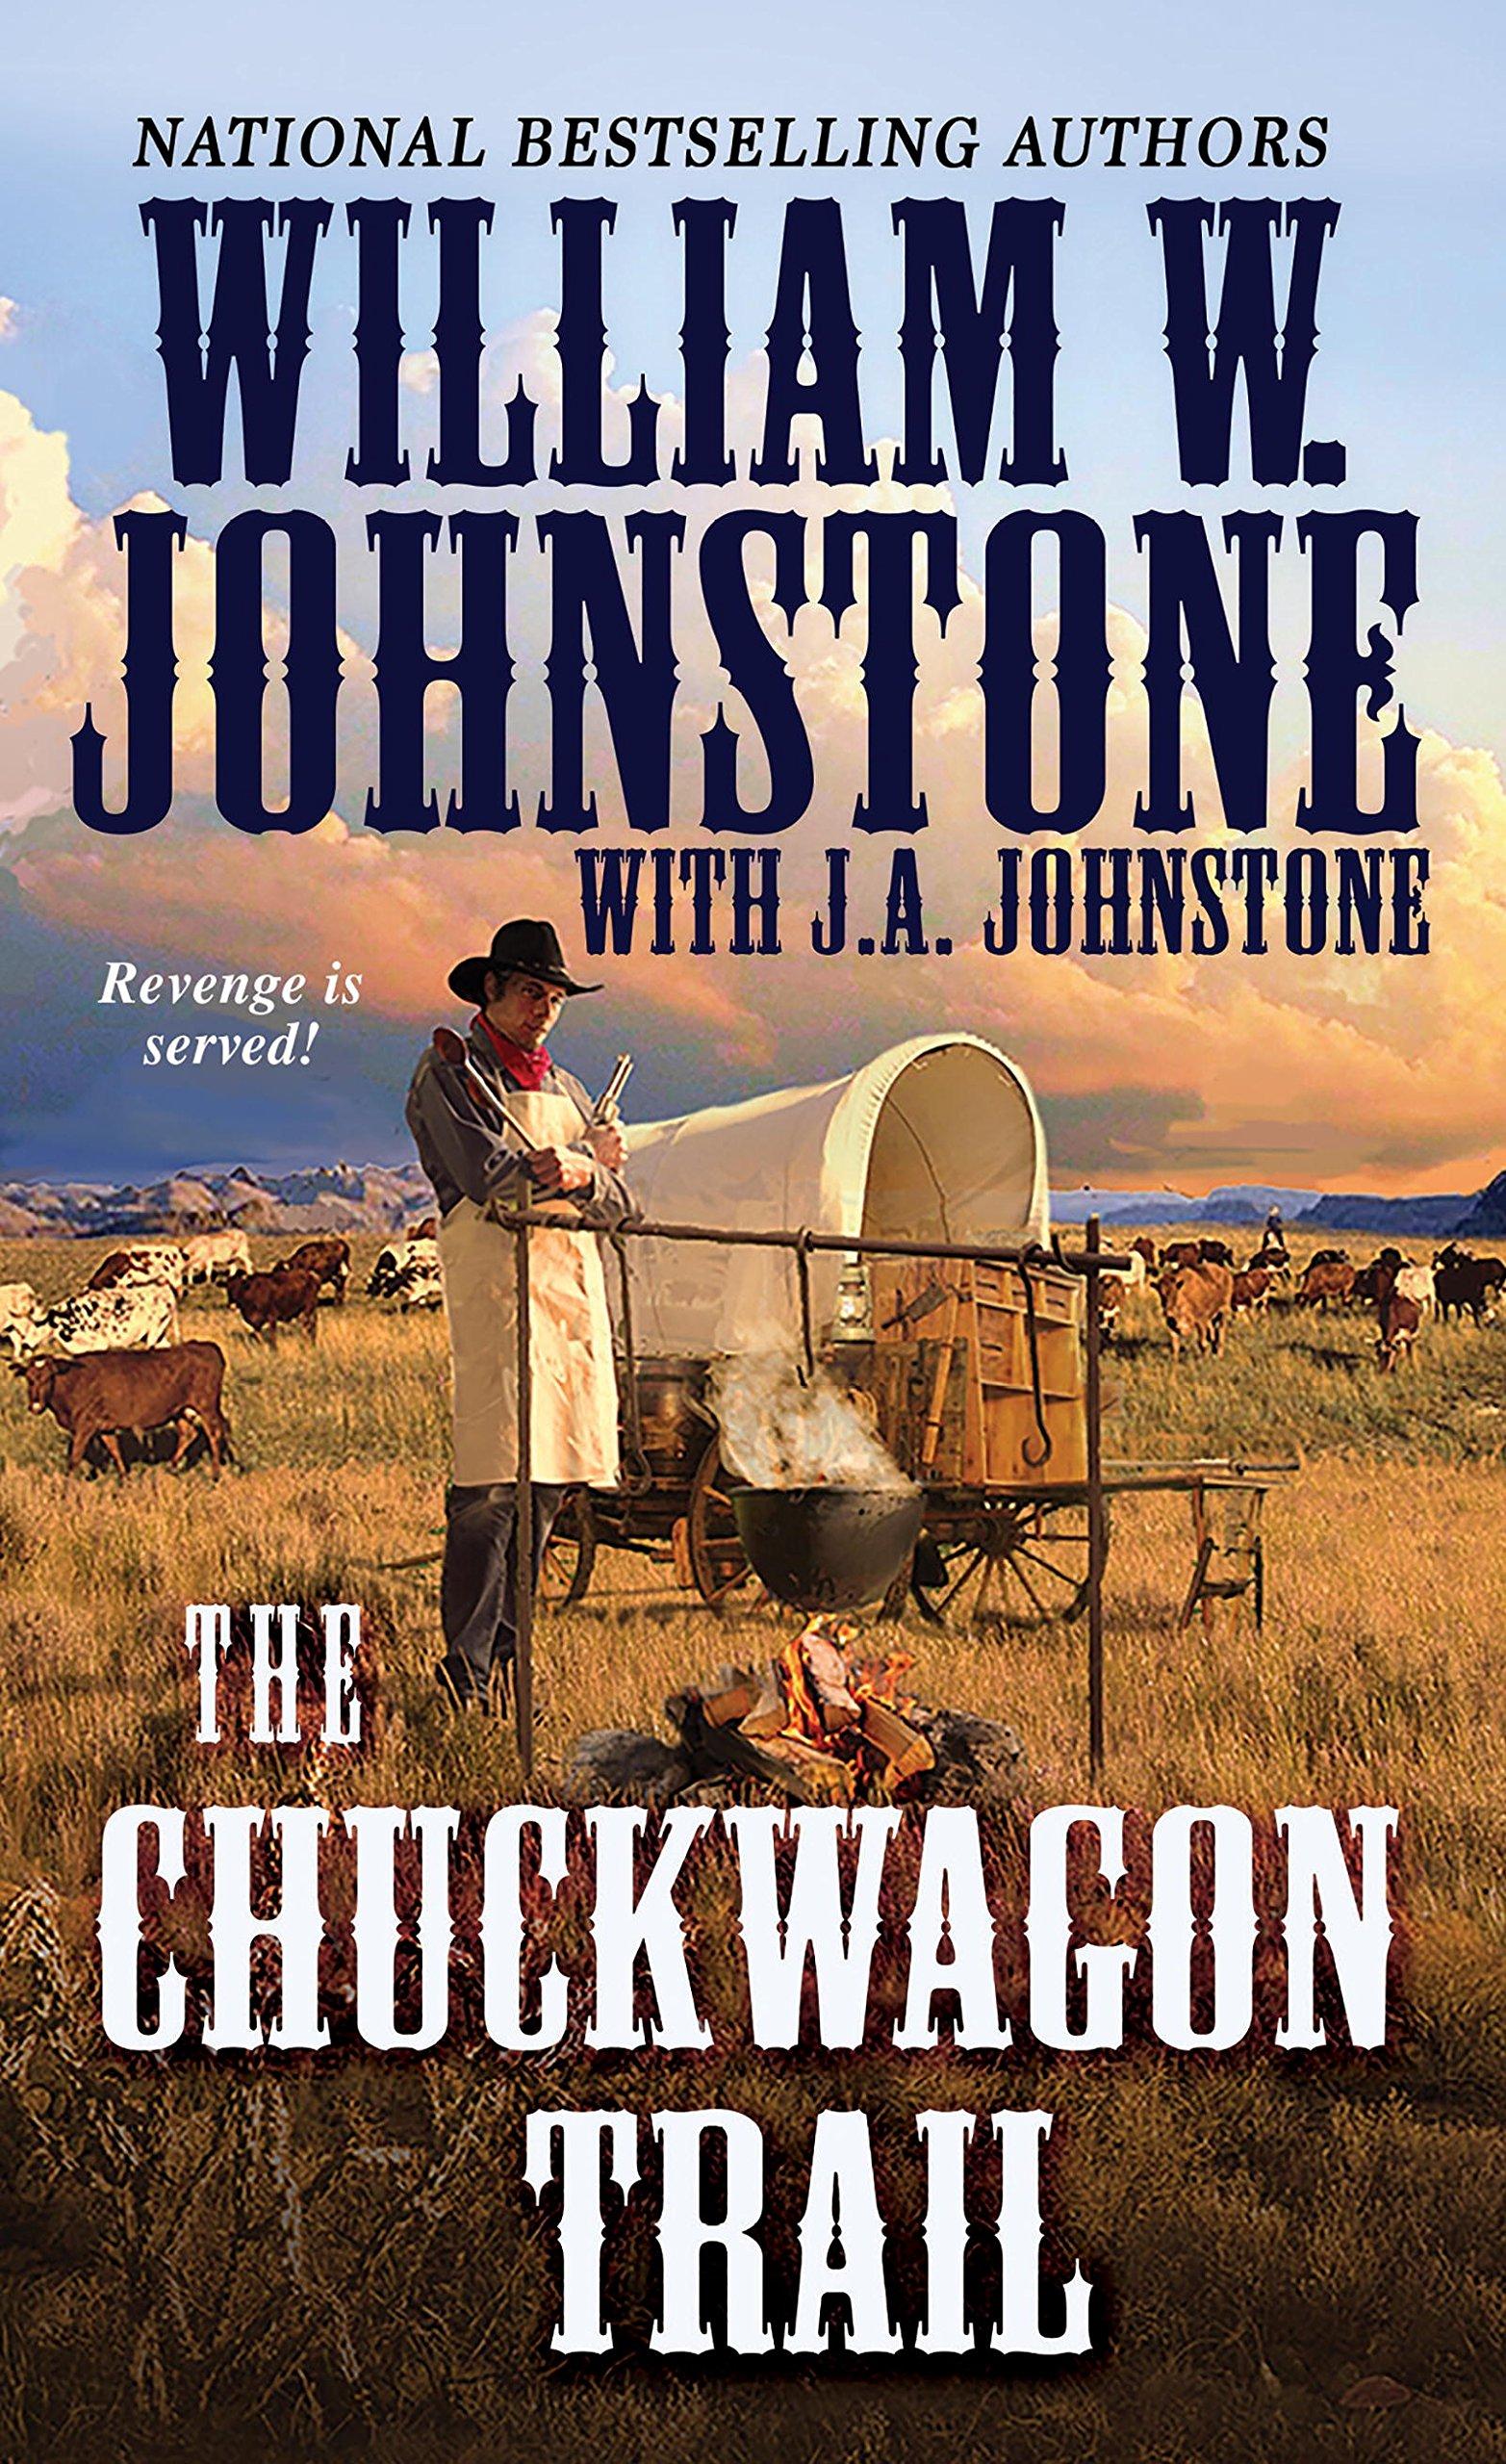 The Chuckwagon Trail (A Chuckwagon Trail Western)